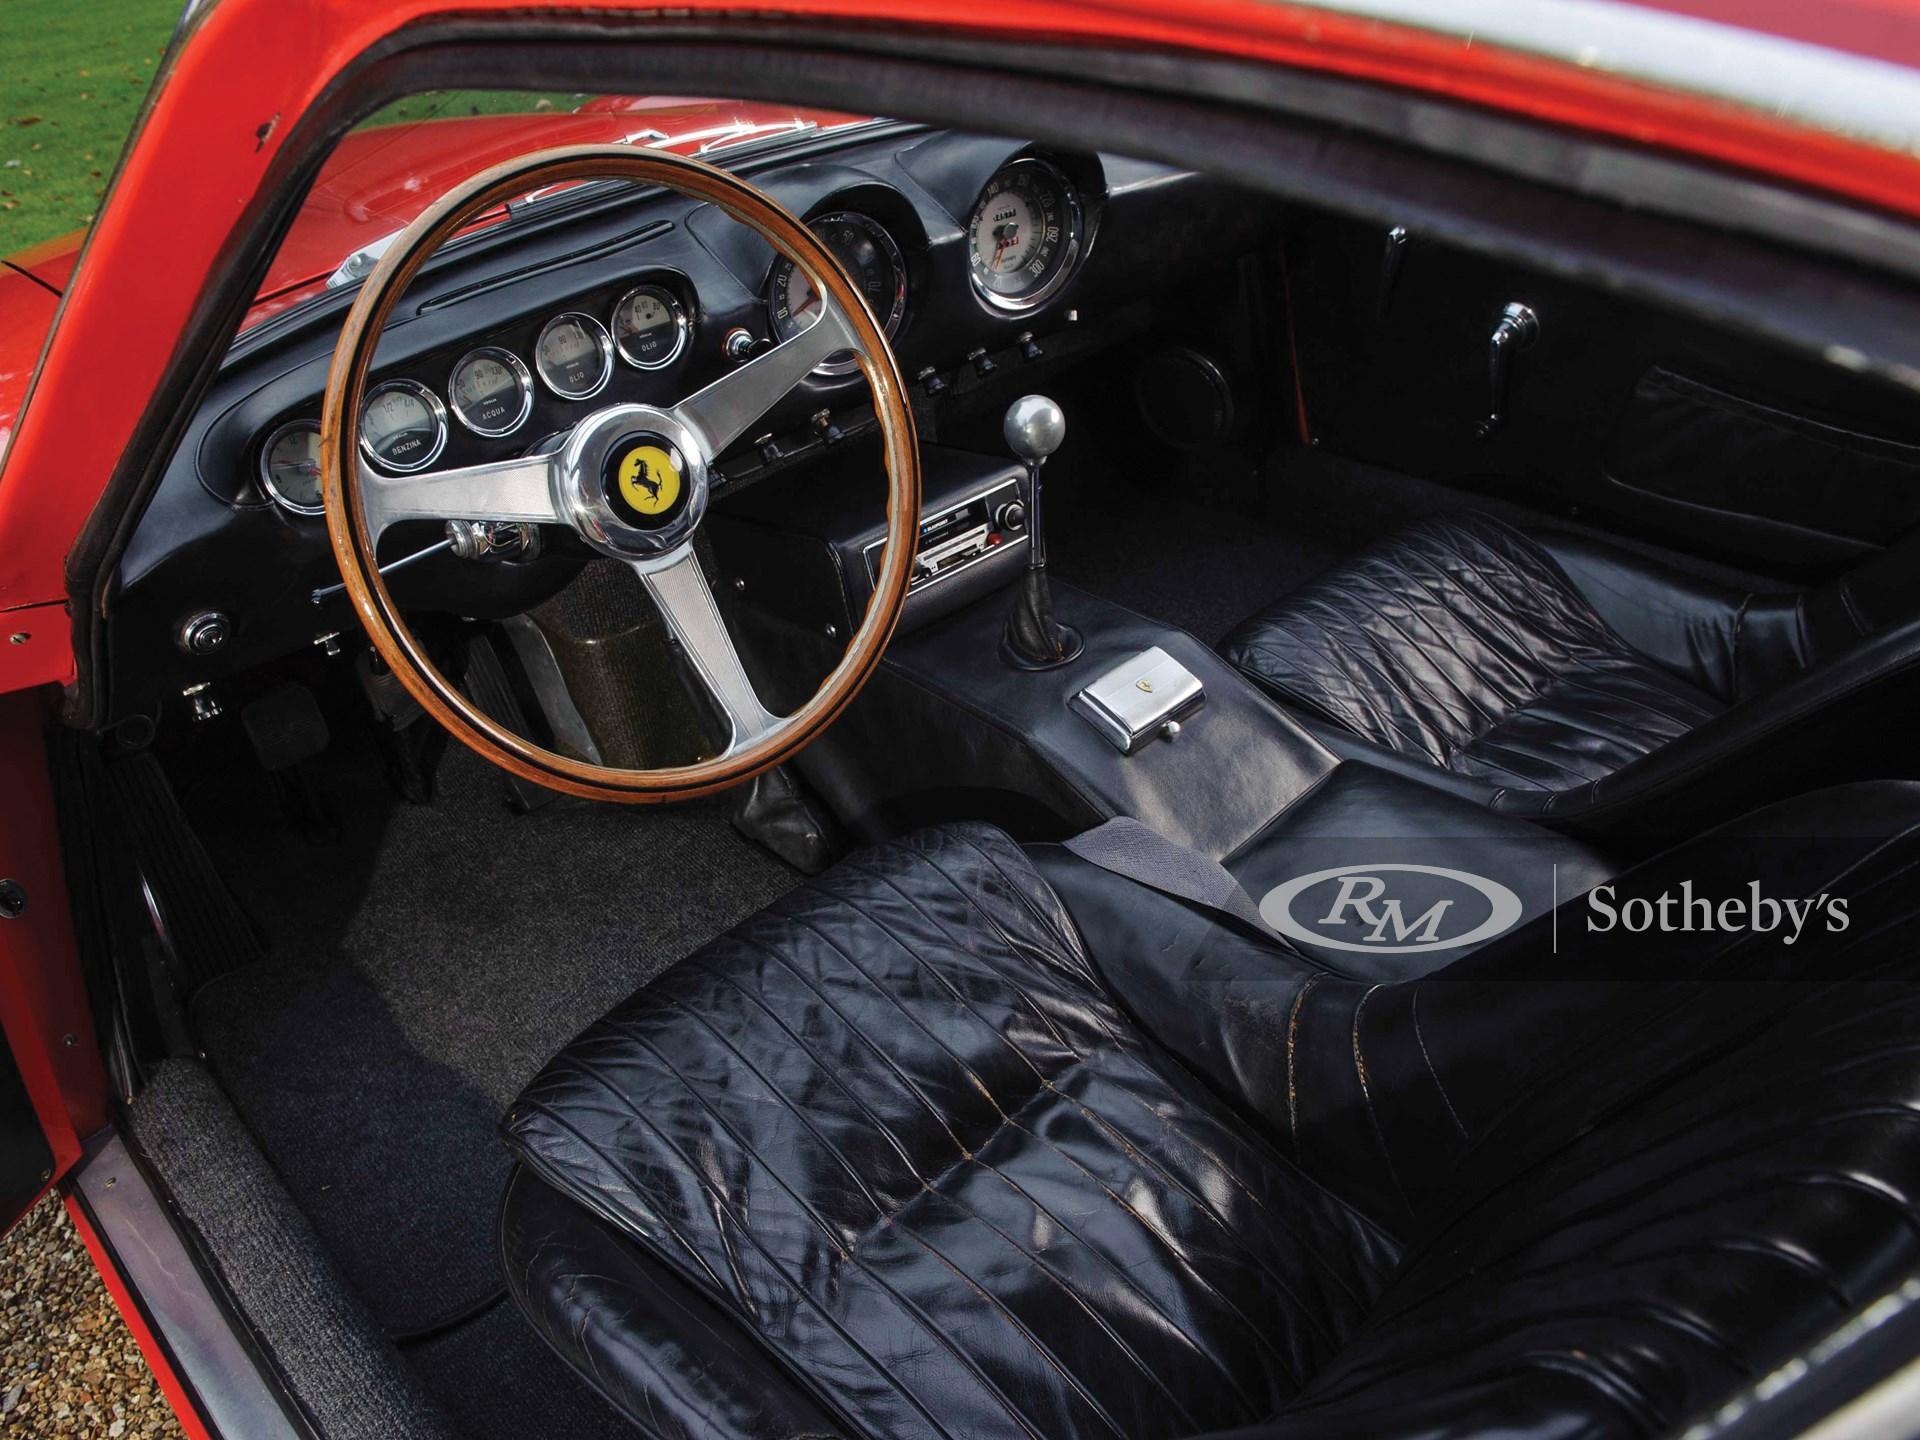 1963 Ferrari 250 GT/L 'Lusso' Berlinetta by Scaglietti -